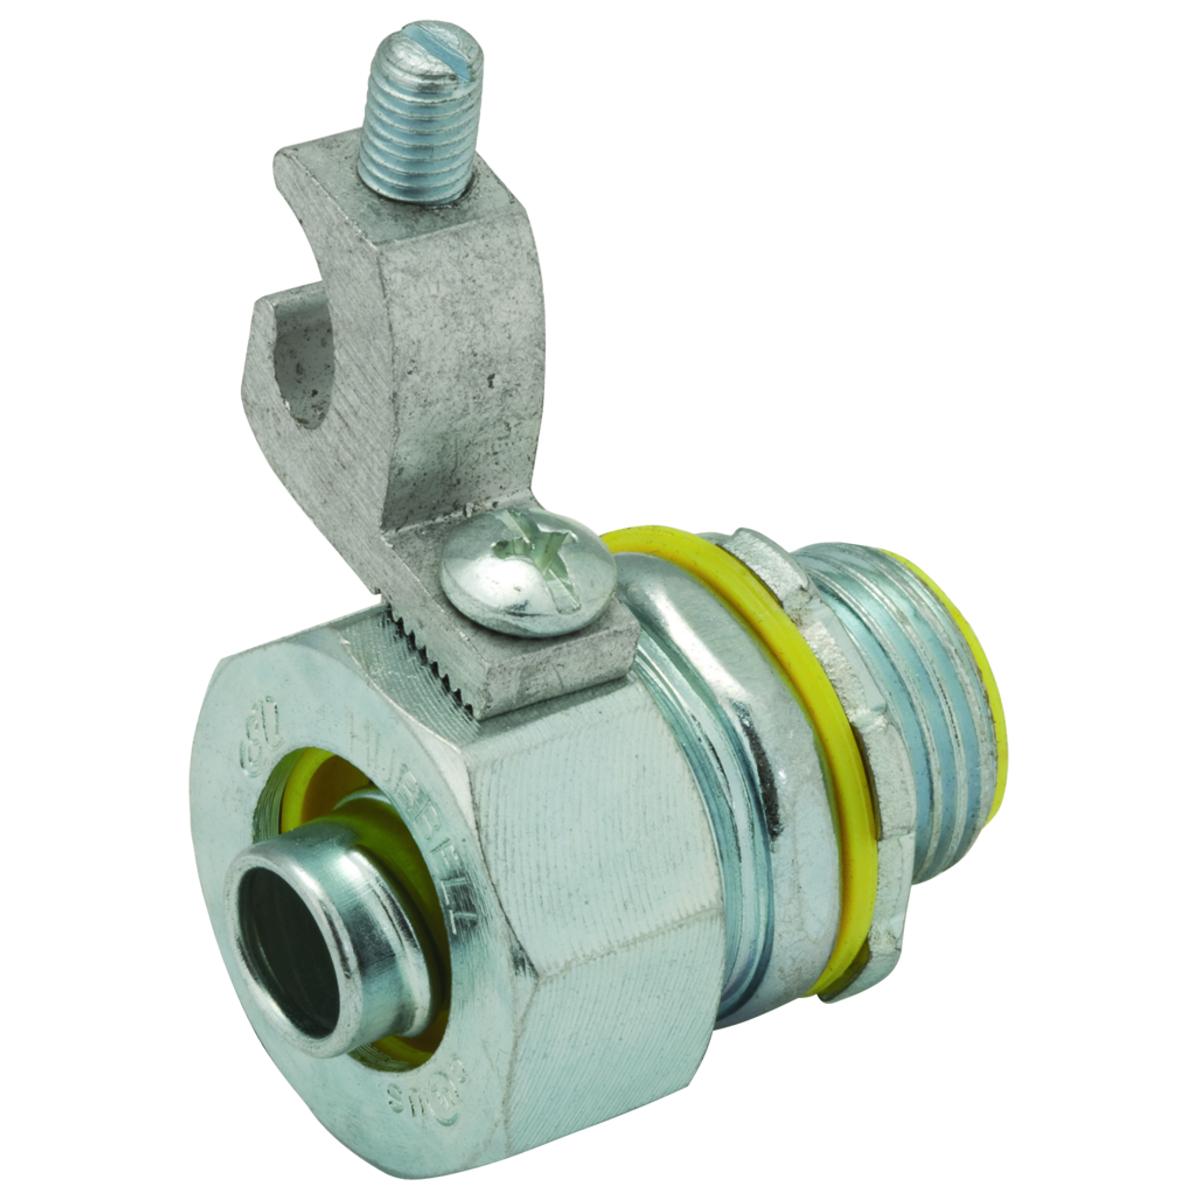 Hubbell-Raco 3511-3 Conduit/Cord Connector